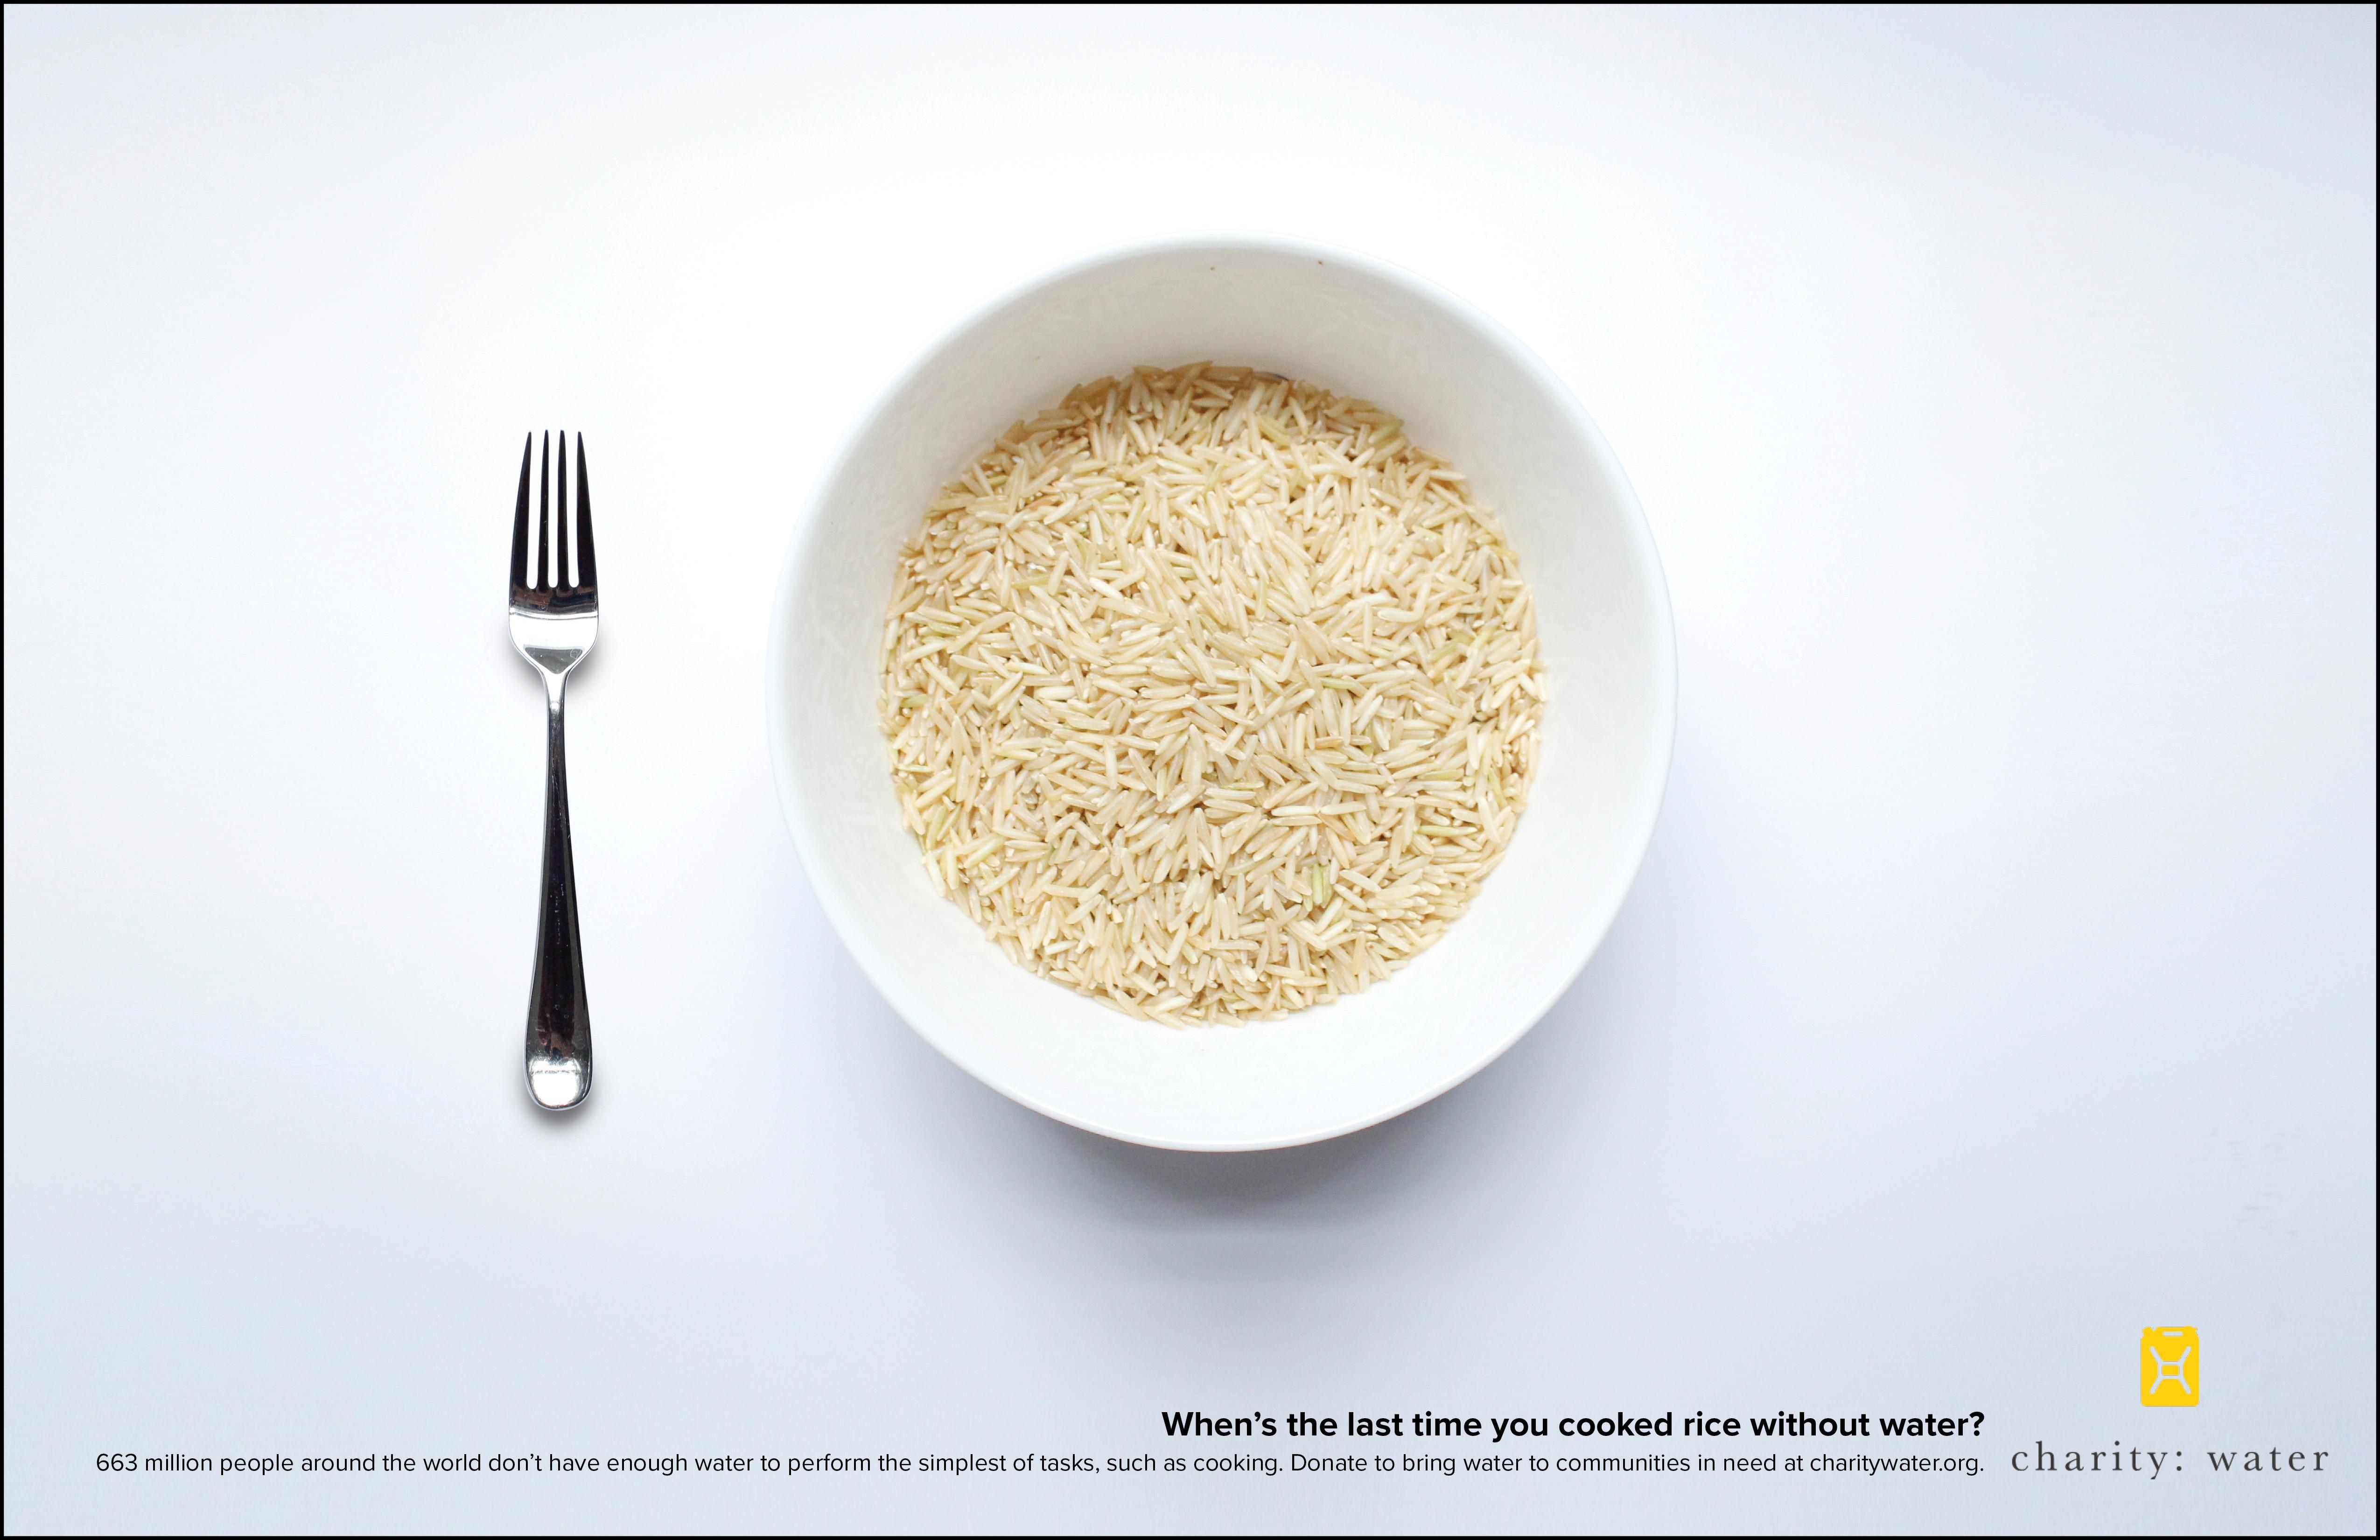 Charity: water Print Ad - Rice